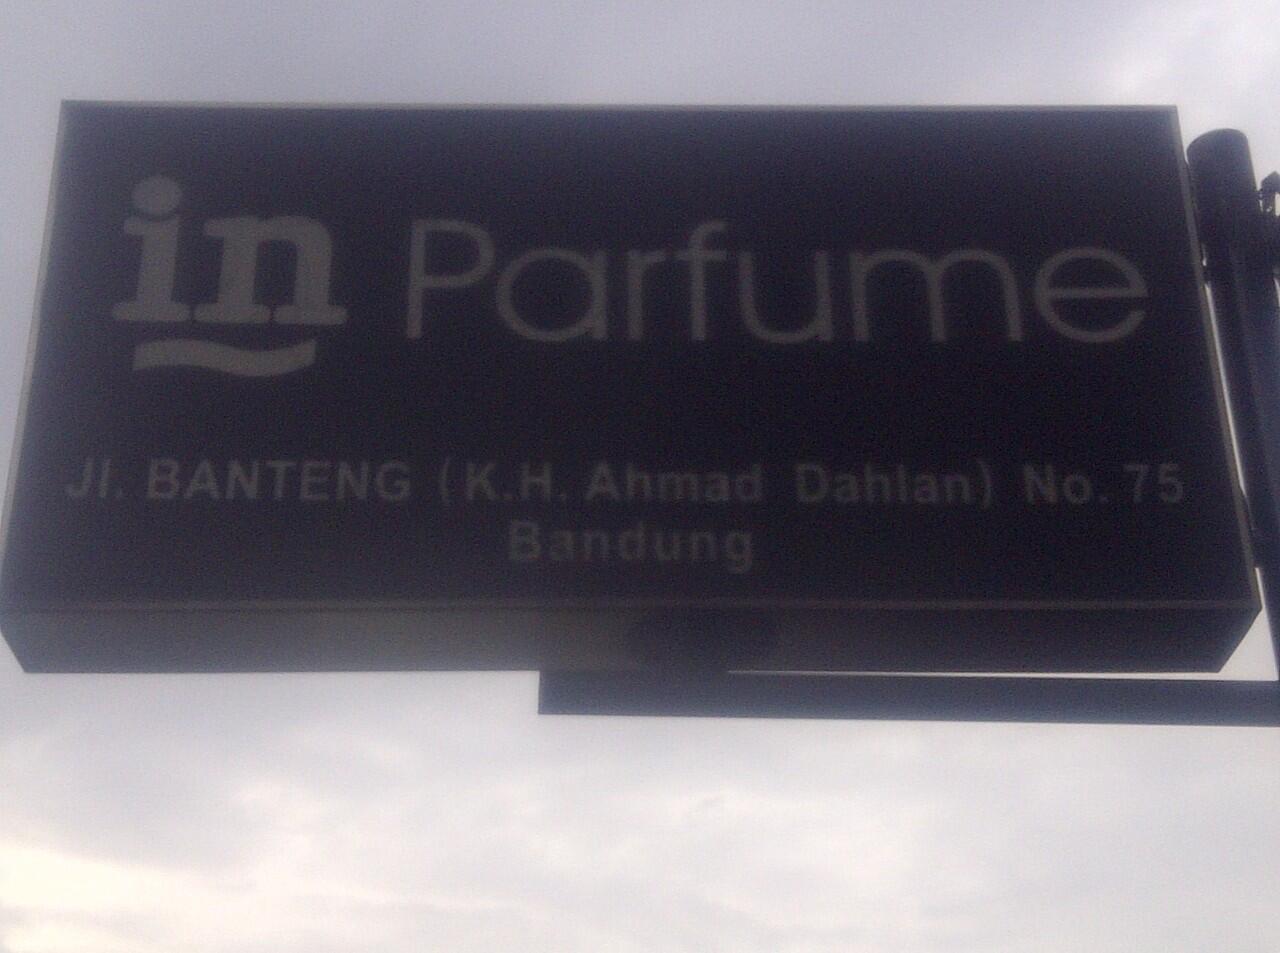 Terjual Parfume Refill Isi Ulang Parfume Di In Parfume Bandung